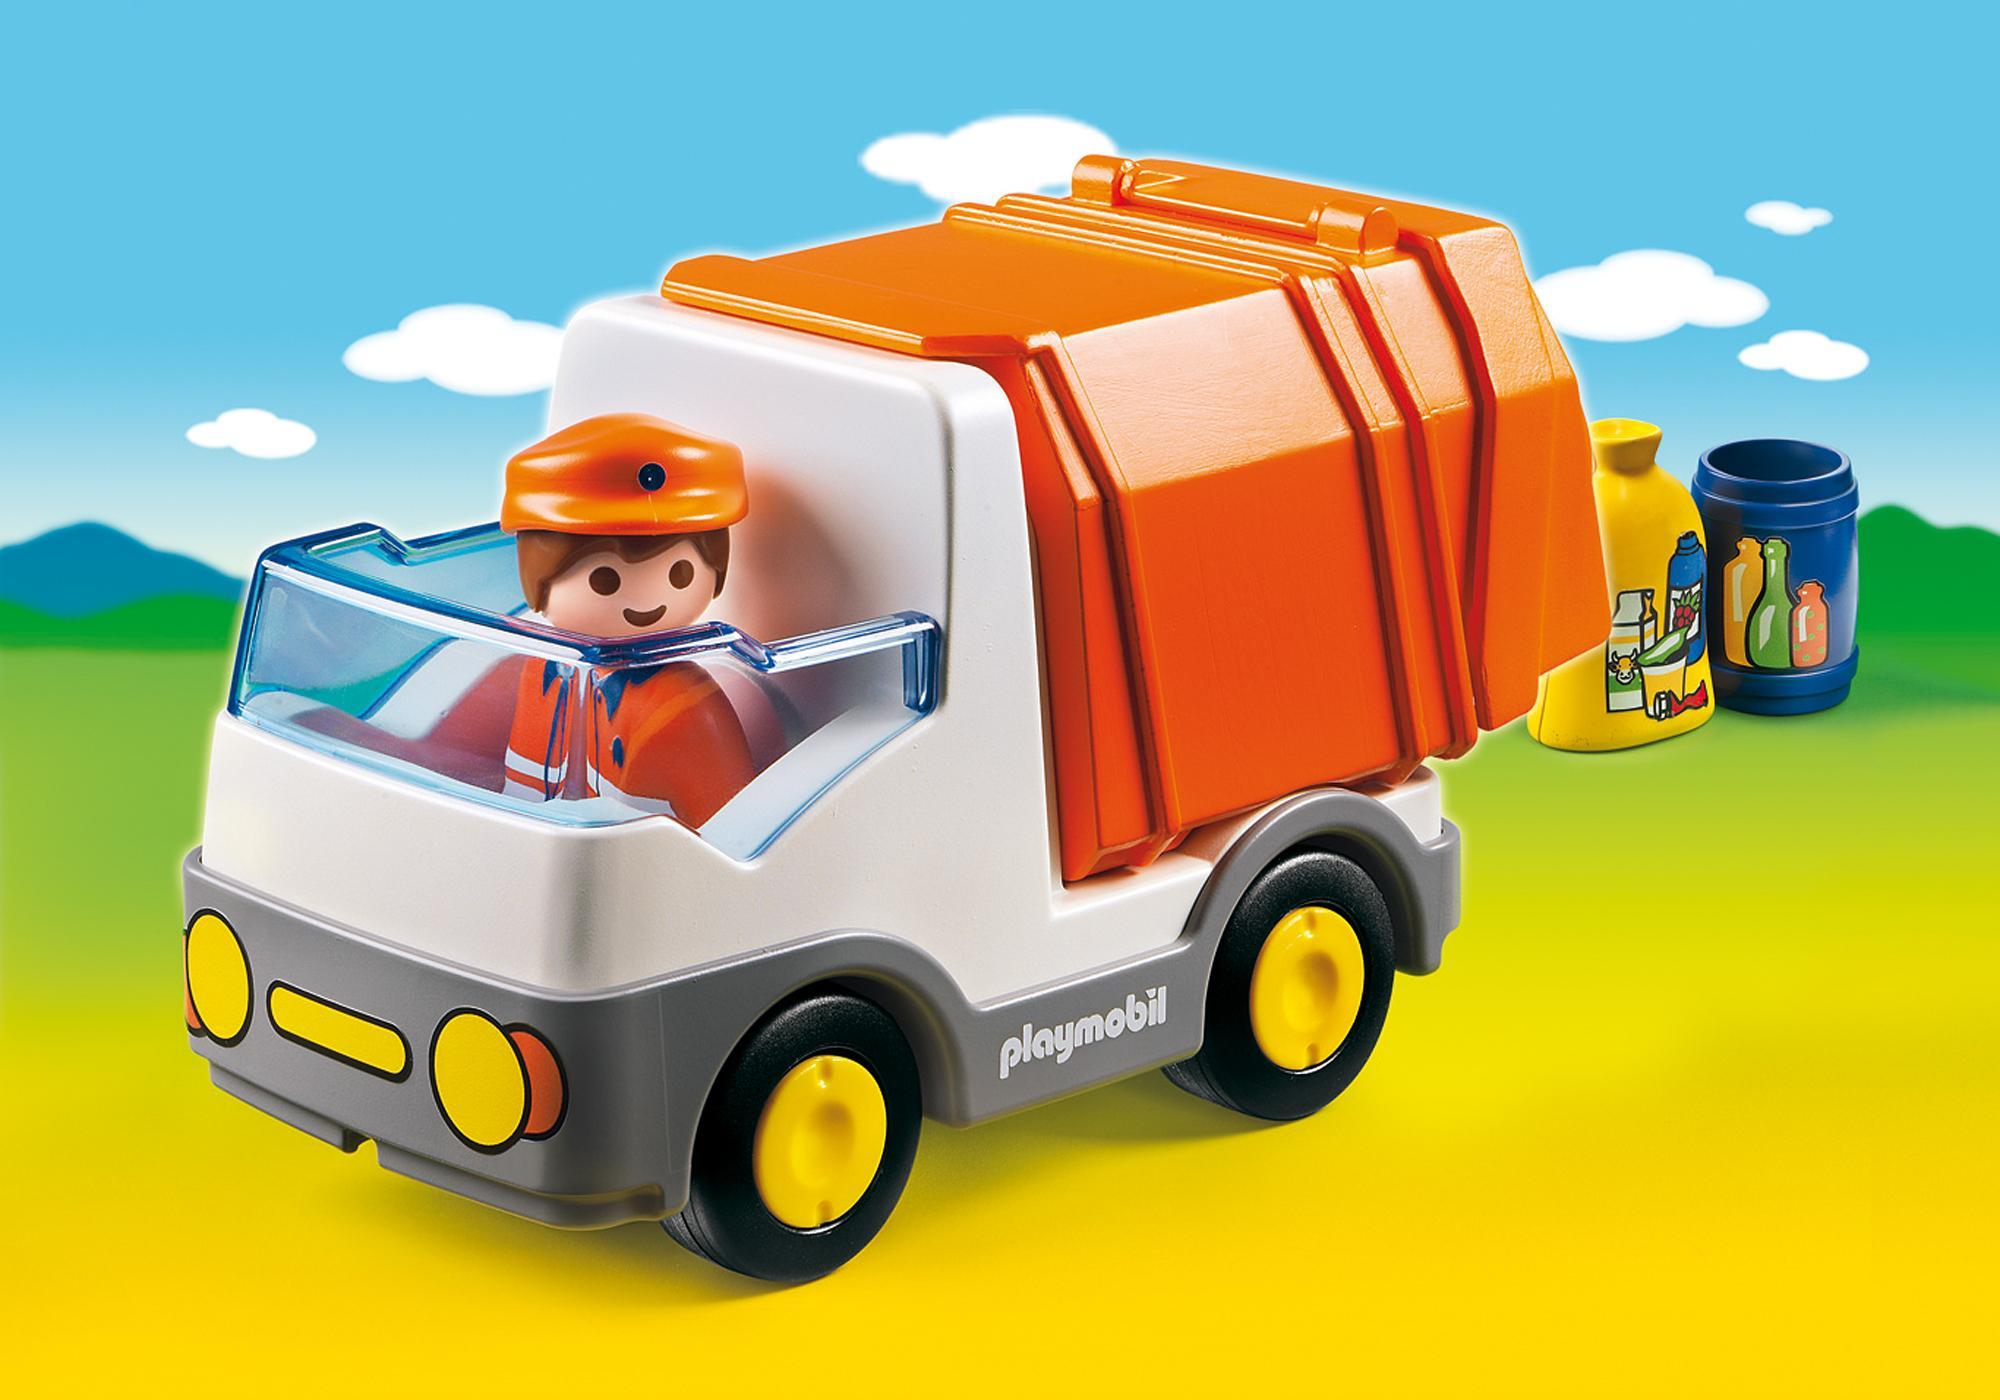 http://media.playmobil.com/i/playmobil/6774_product_detail/Camion smaltimento rifiuti